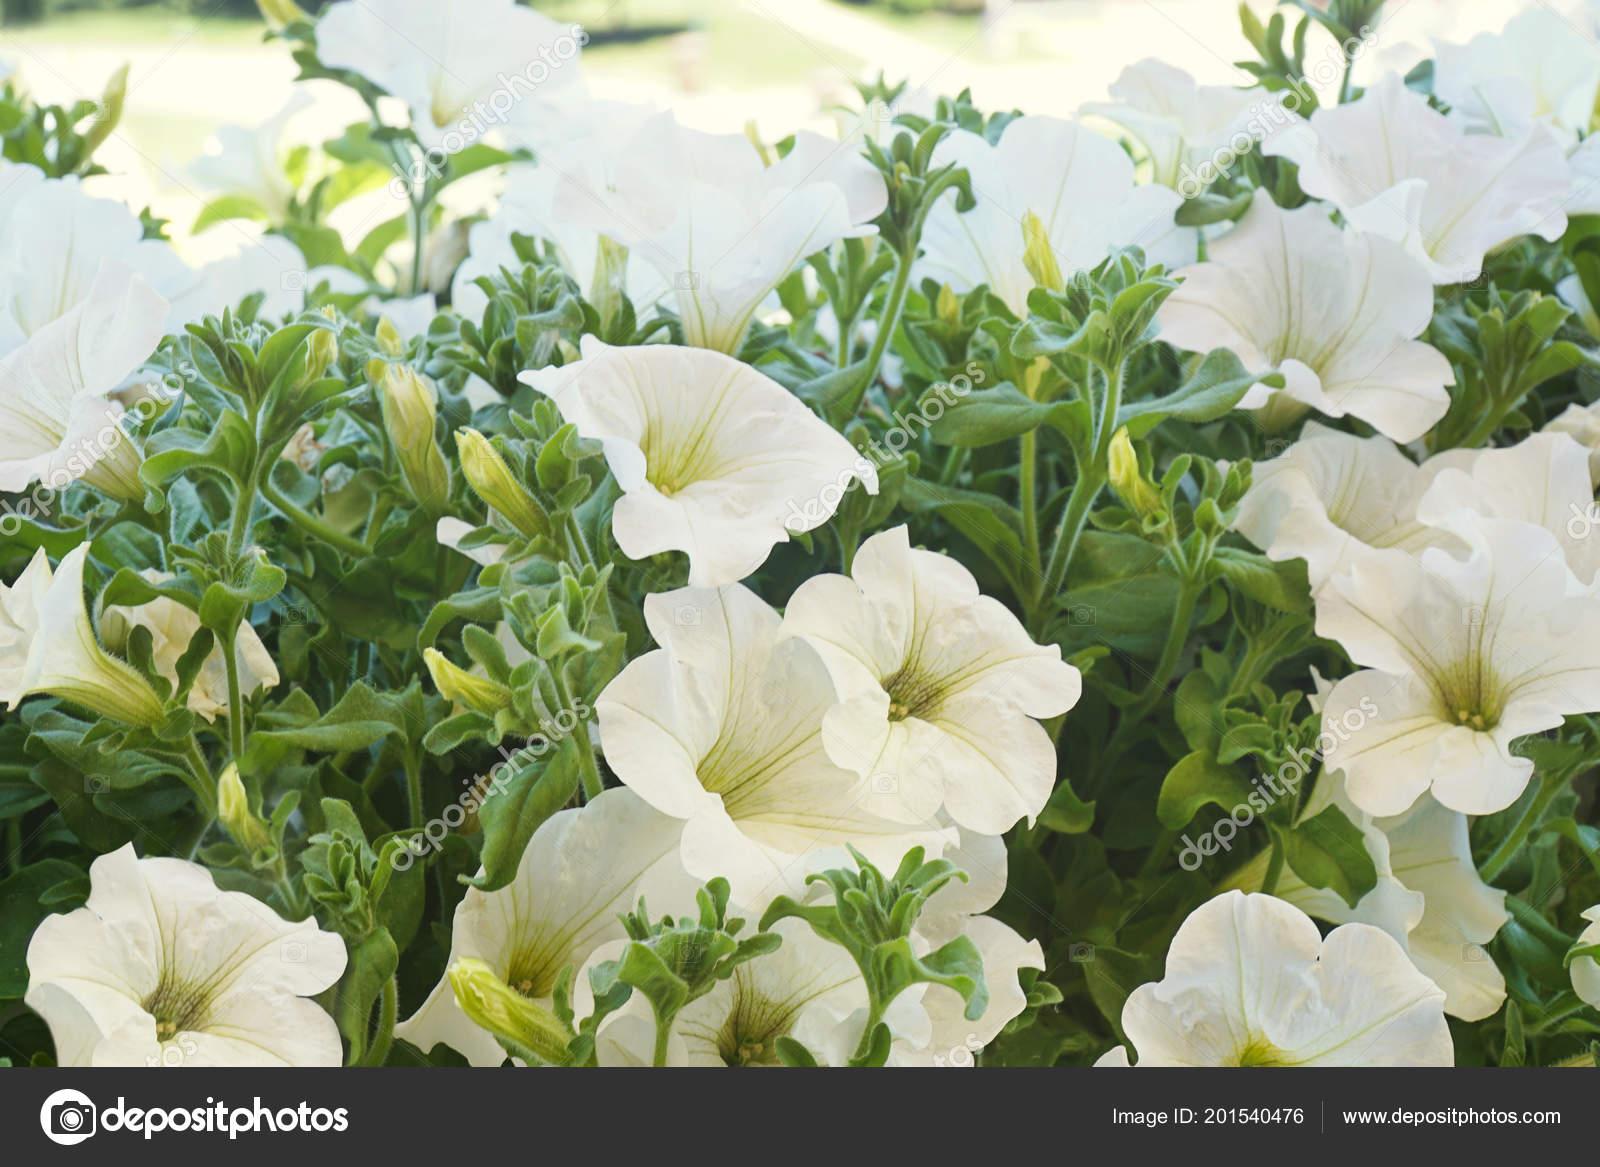 White Petunia Flowers Sun Stock Photo Sandralise 201540476